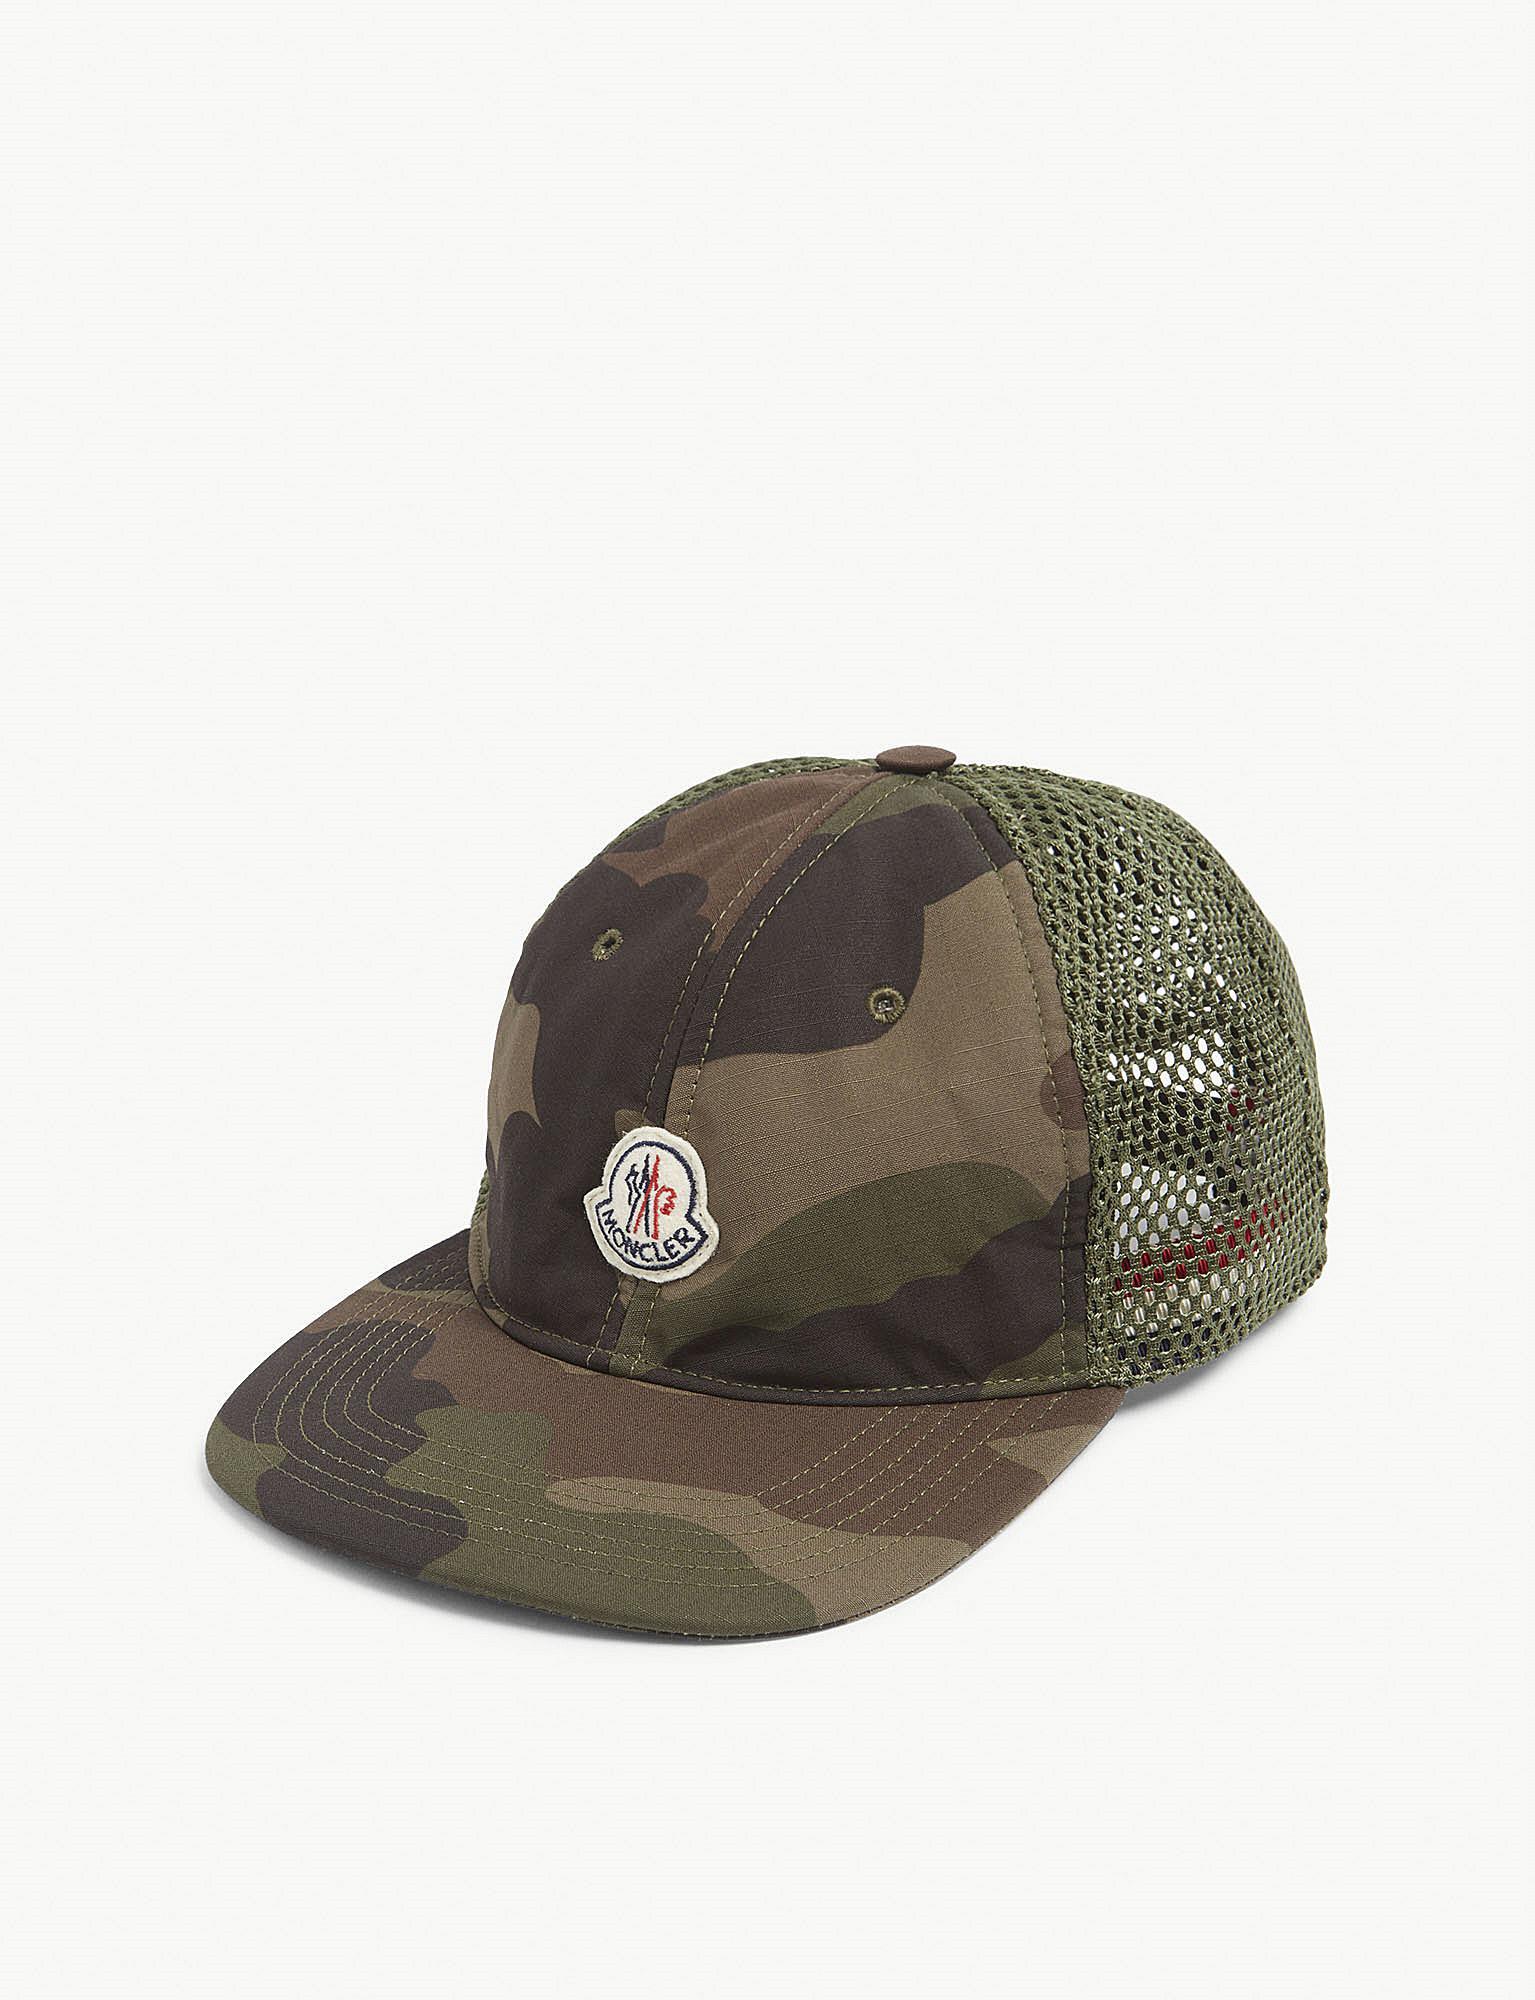 Lyst - Moncler Logo Mesh Camouflage Baseball Cap in Green for Men 24a3e52b640